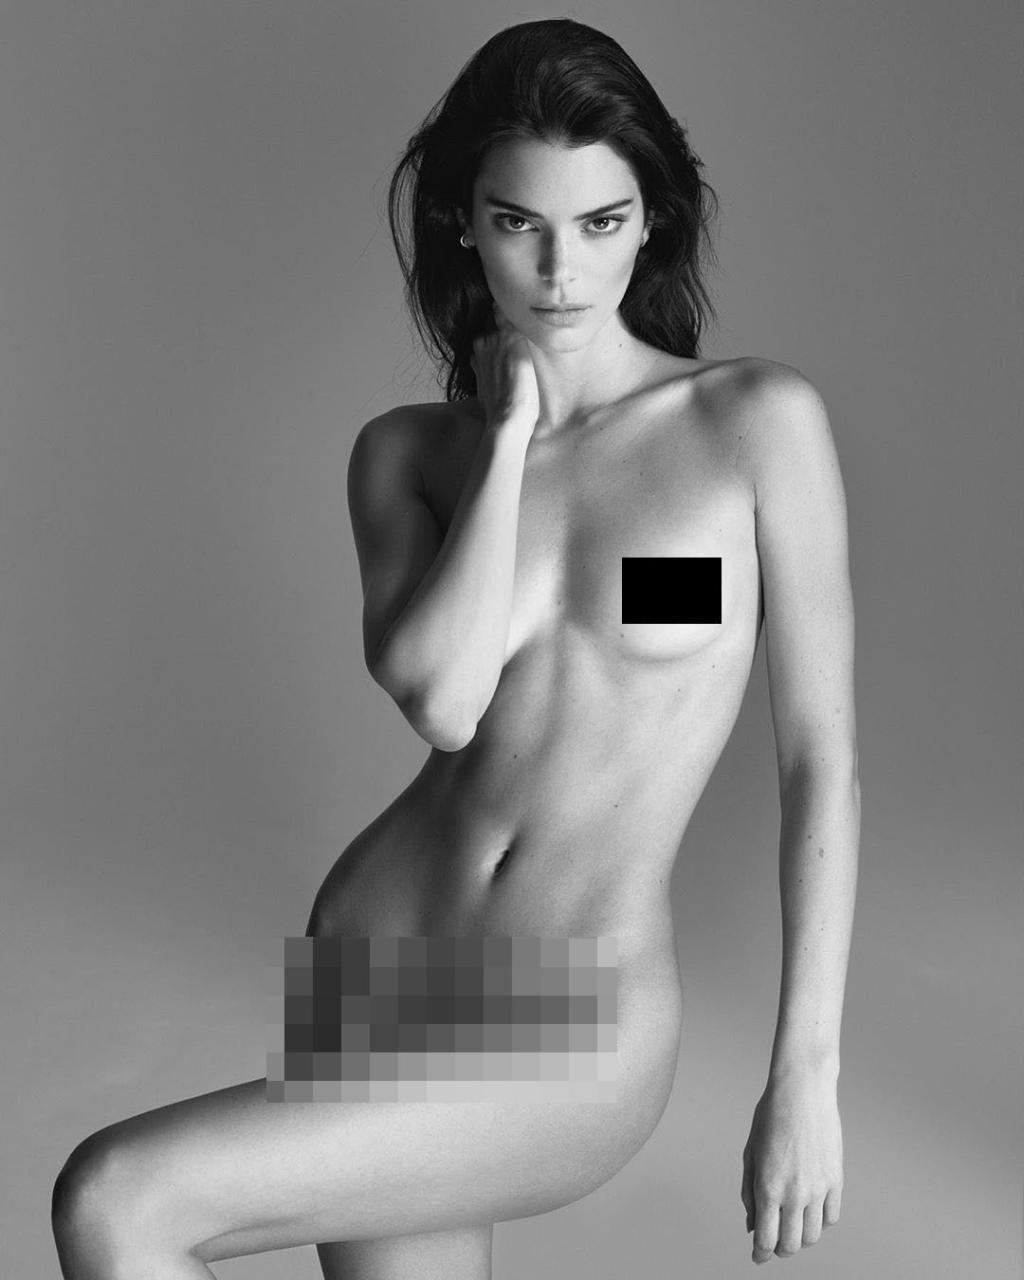 Kendall Cenner türk fotoqraf üçün lüt soyundu - 5 milyonluq FOTO